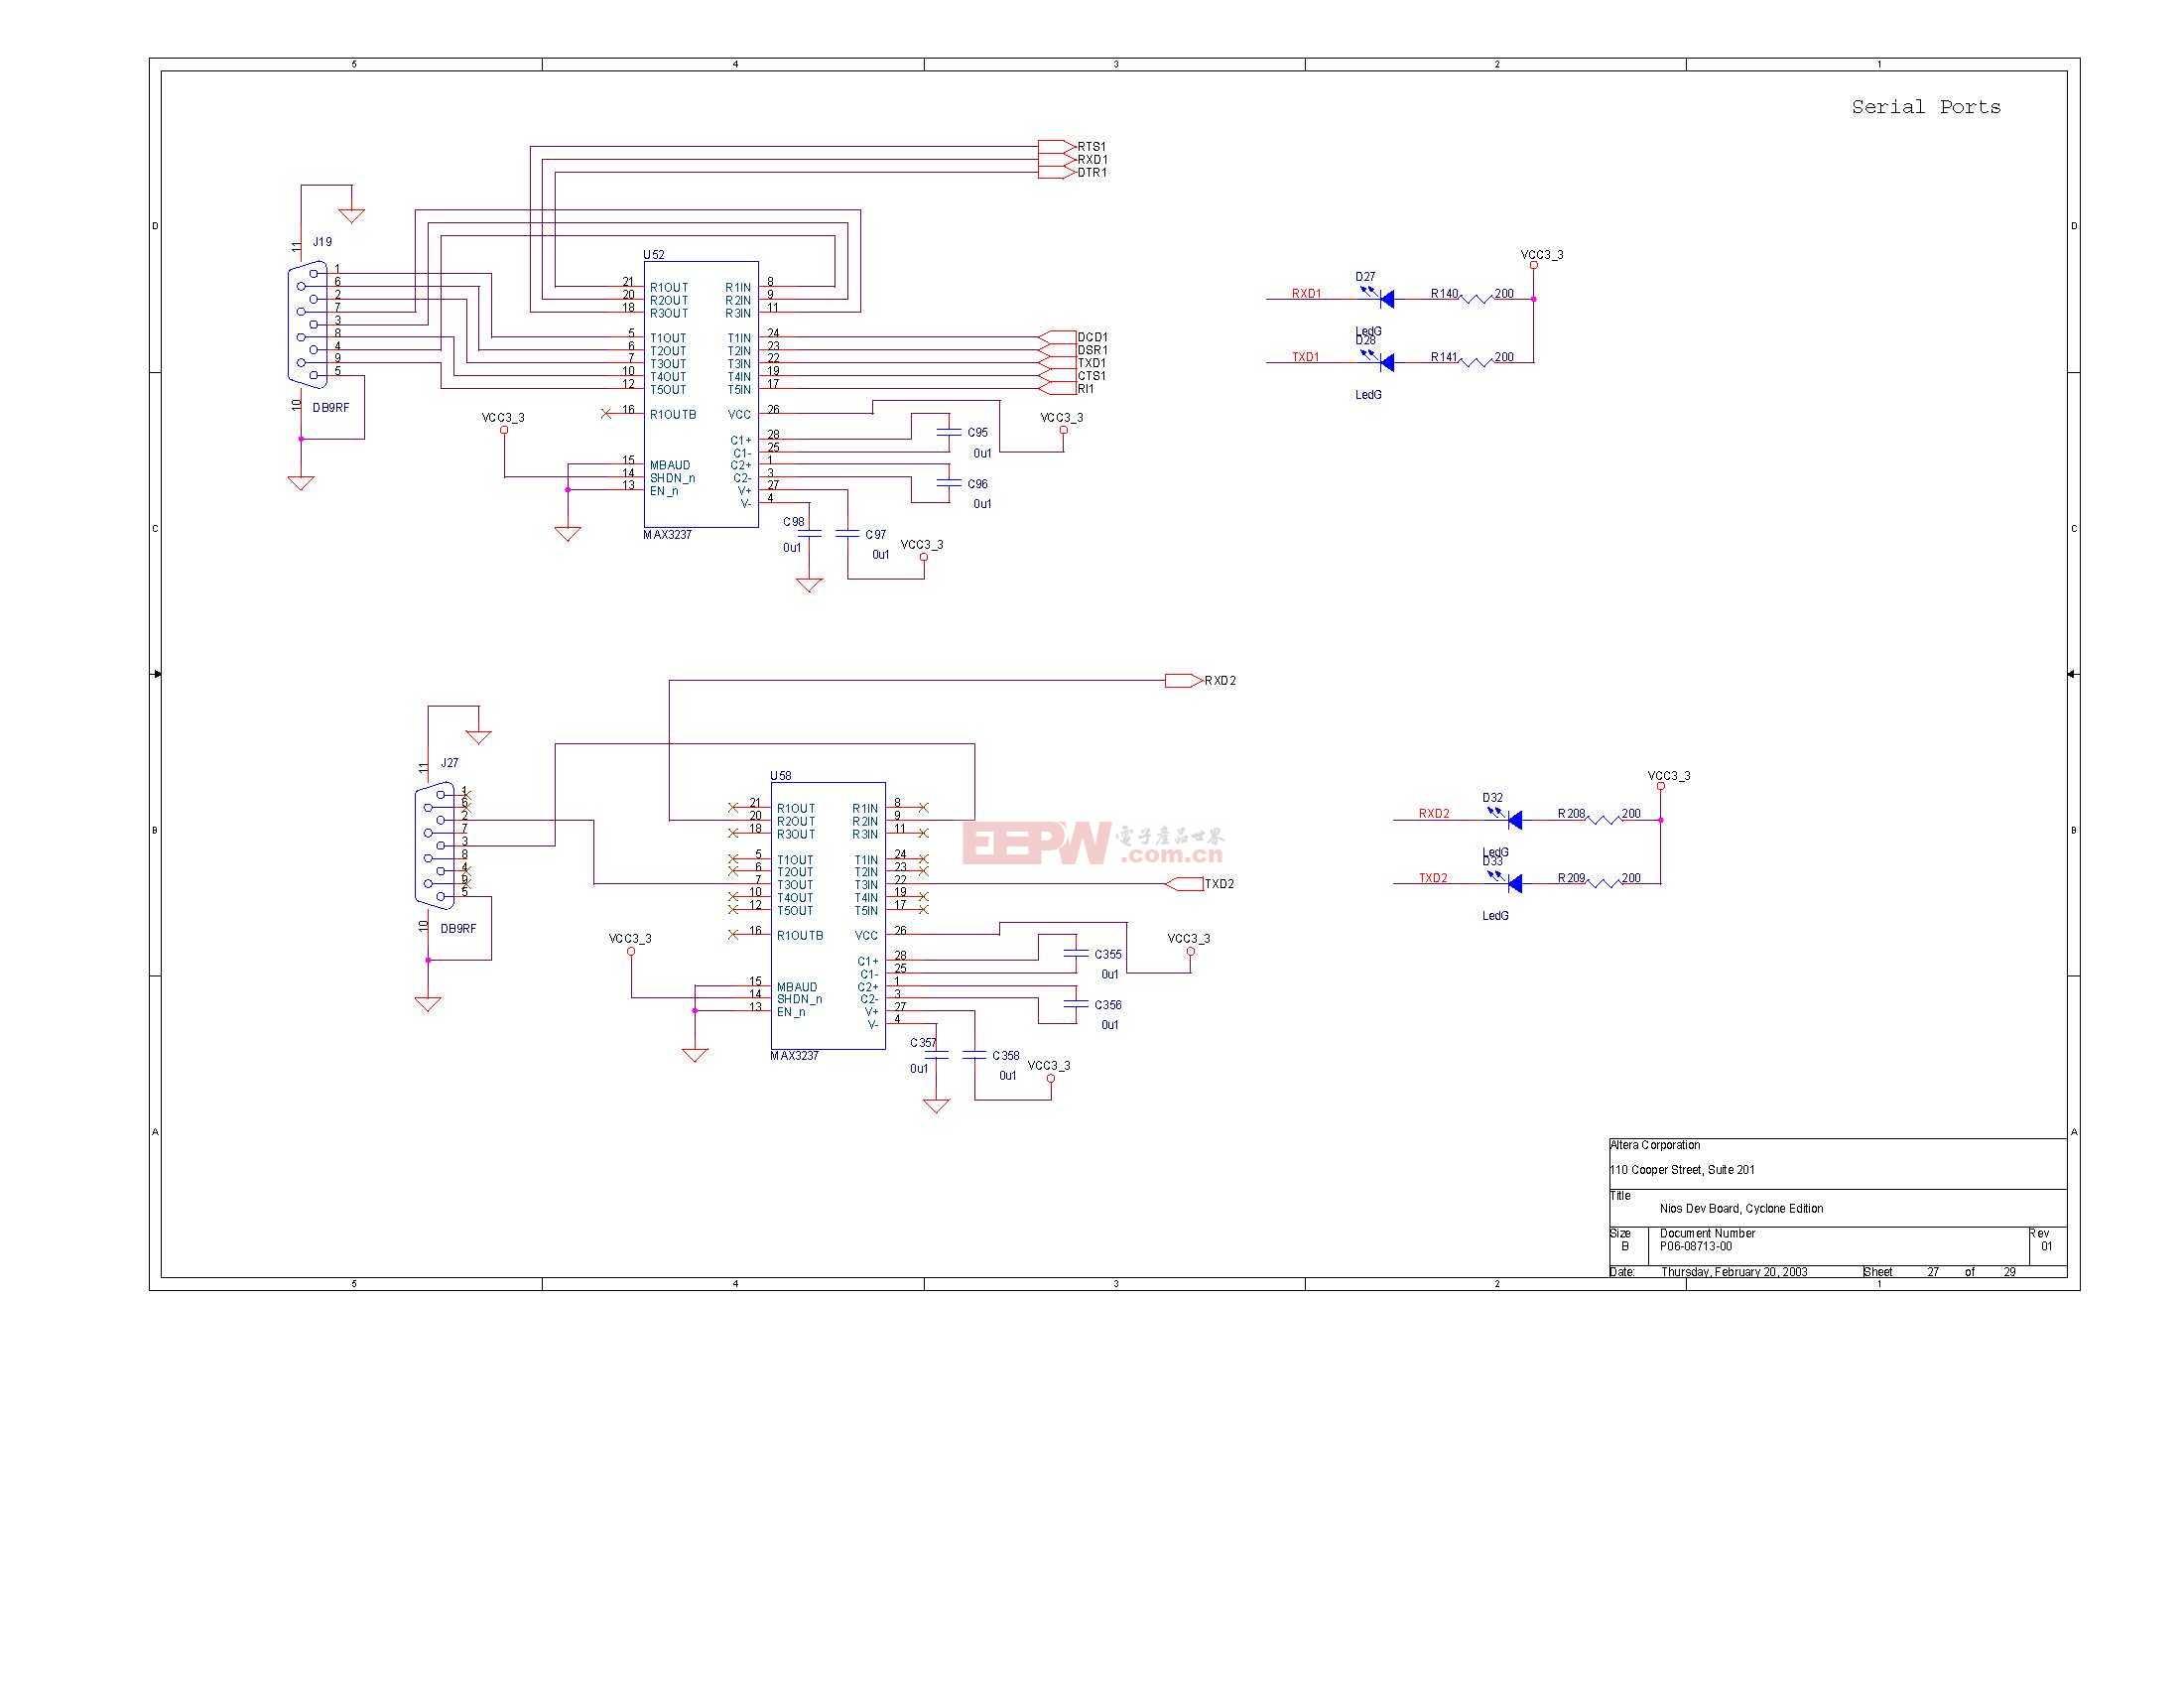 NIOS开发板电路图(Altera官方版)26